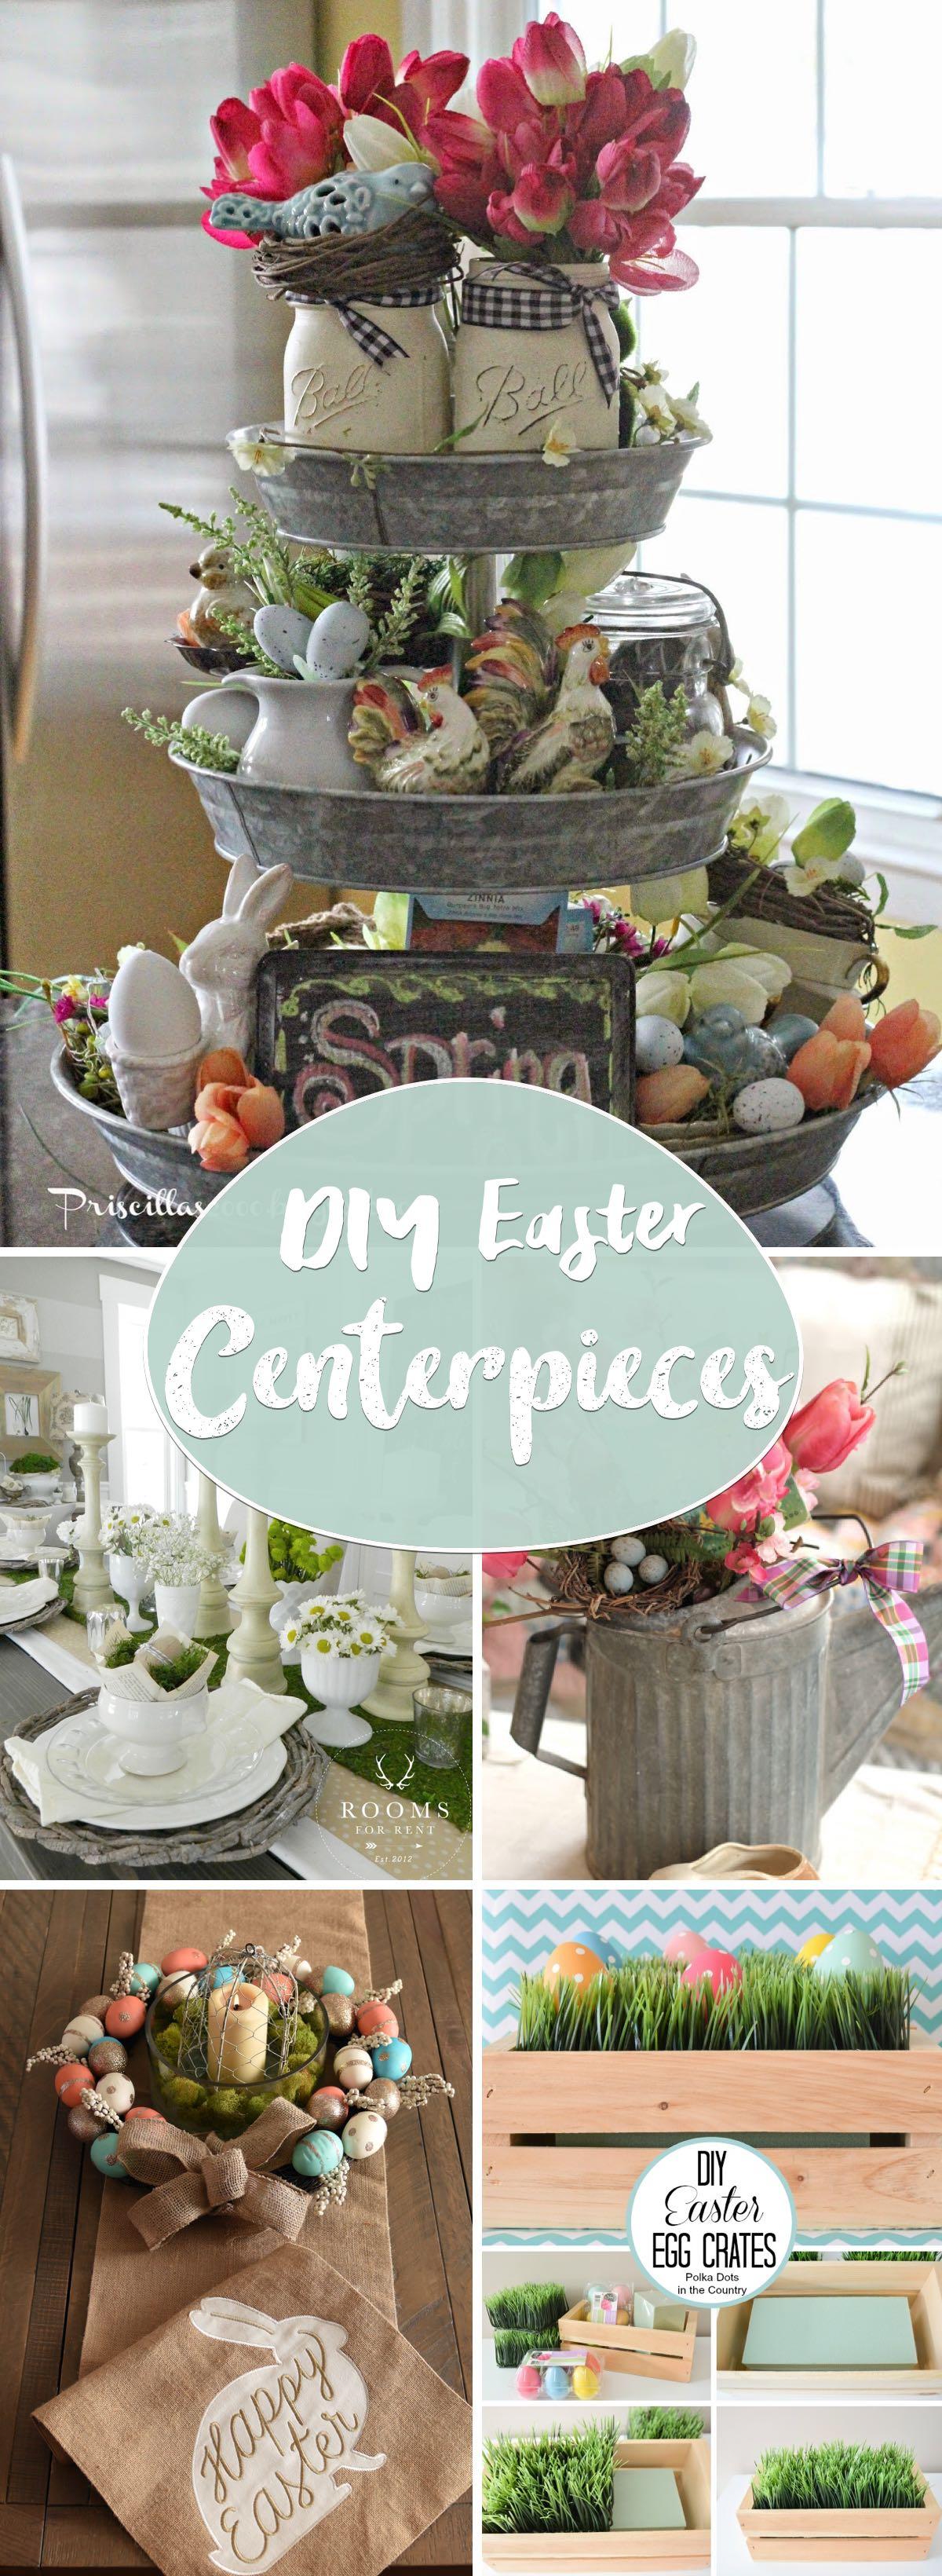 DIY Easter Centerpieces Ready to Cast a Heartwarming Spell